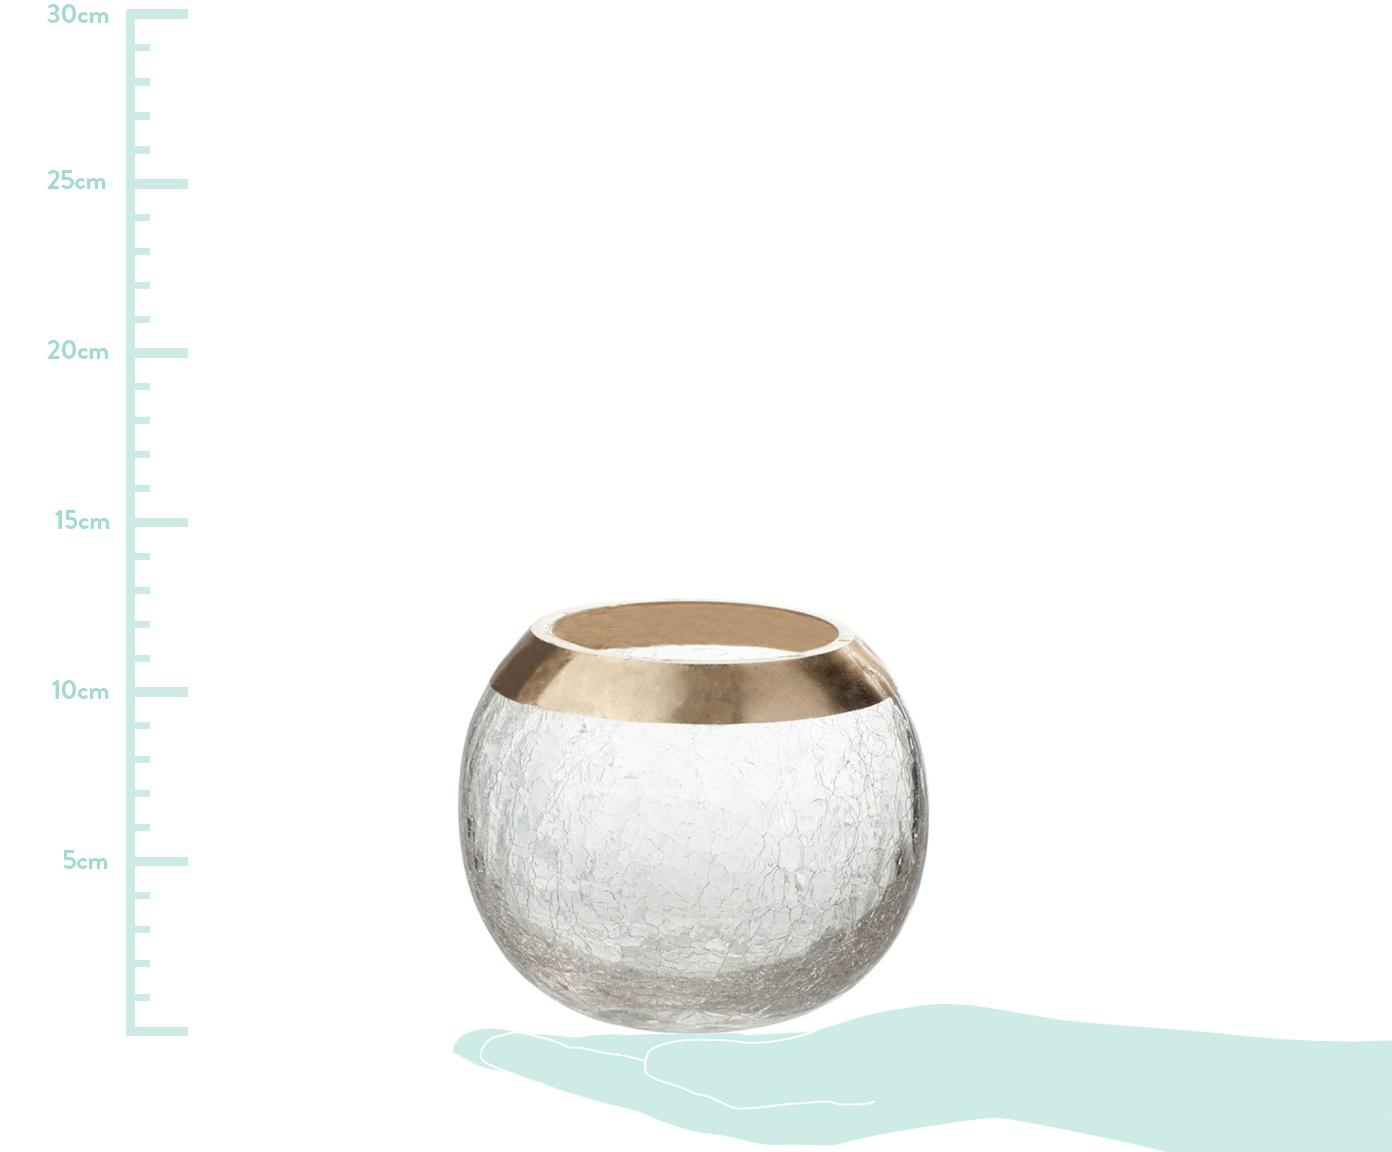 Teelichthalter Lackle, Glas, lackiert, Transparent, Goldfarben, Ø 14 x H 11 cm